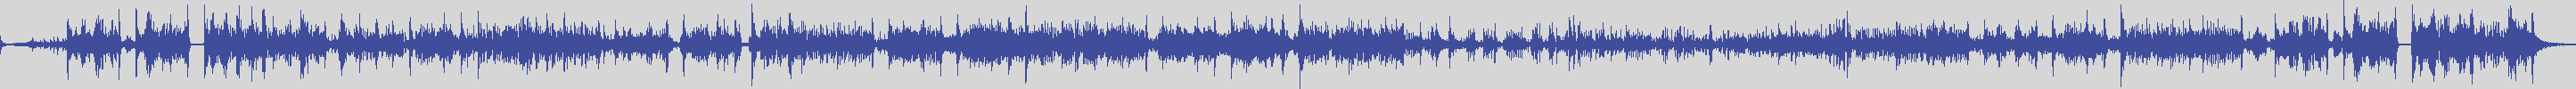 worldwide_music_records [WMR004] Marabou - Crazy Baby [Original Mix] audio wave form